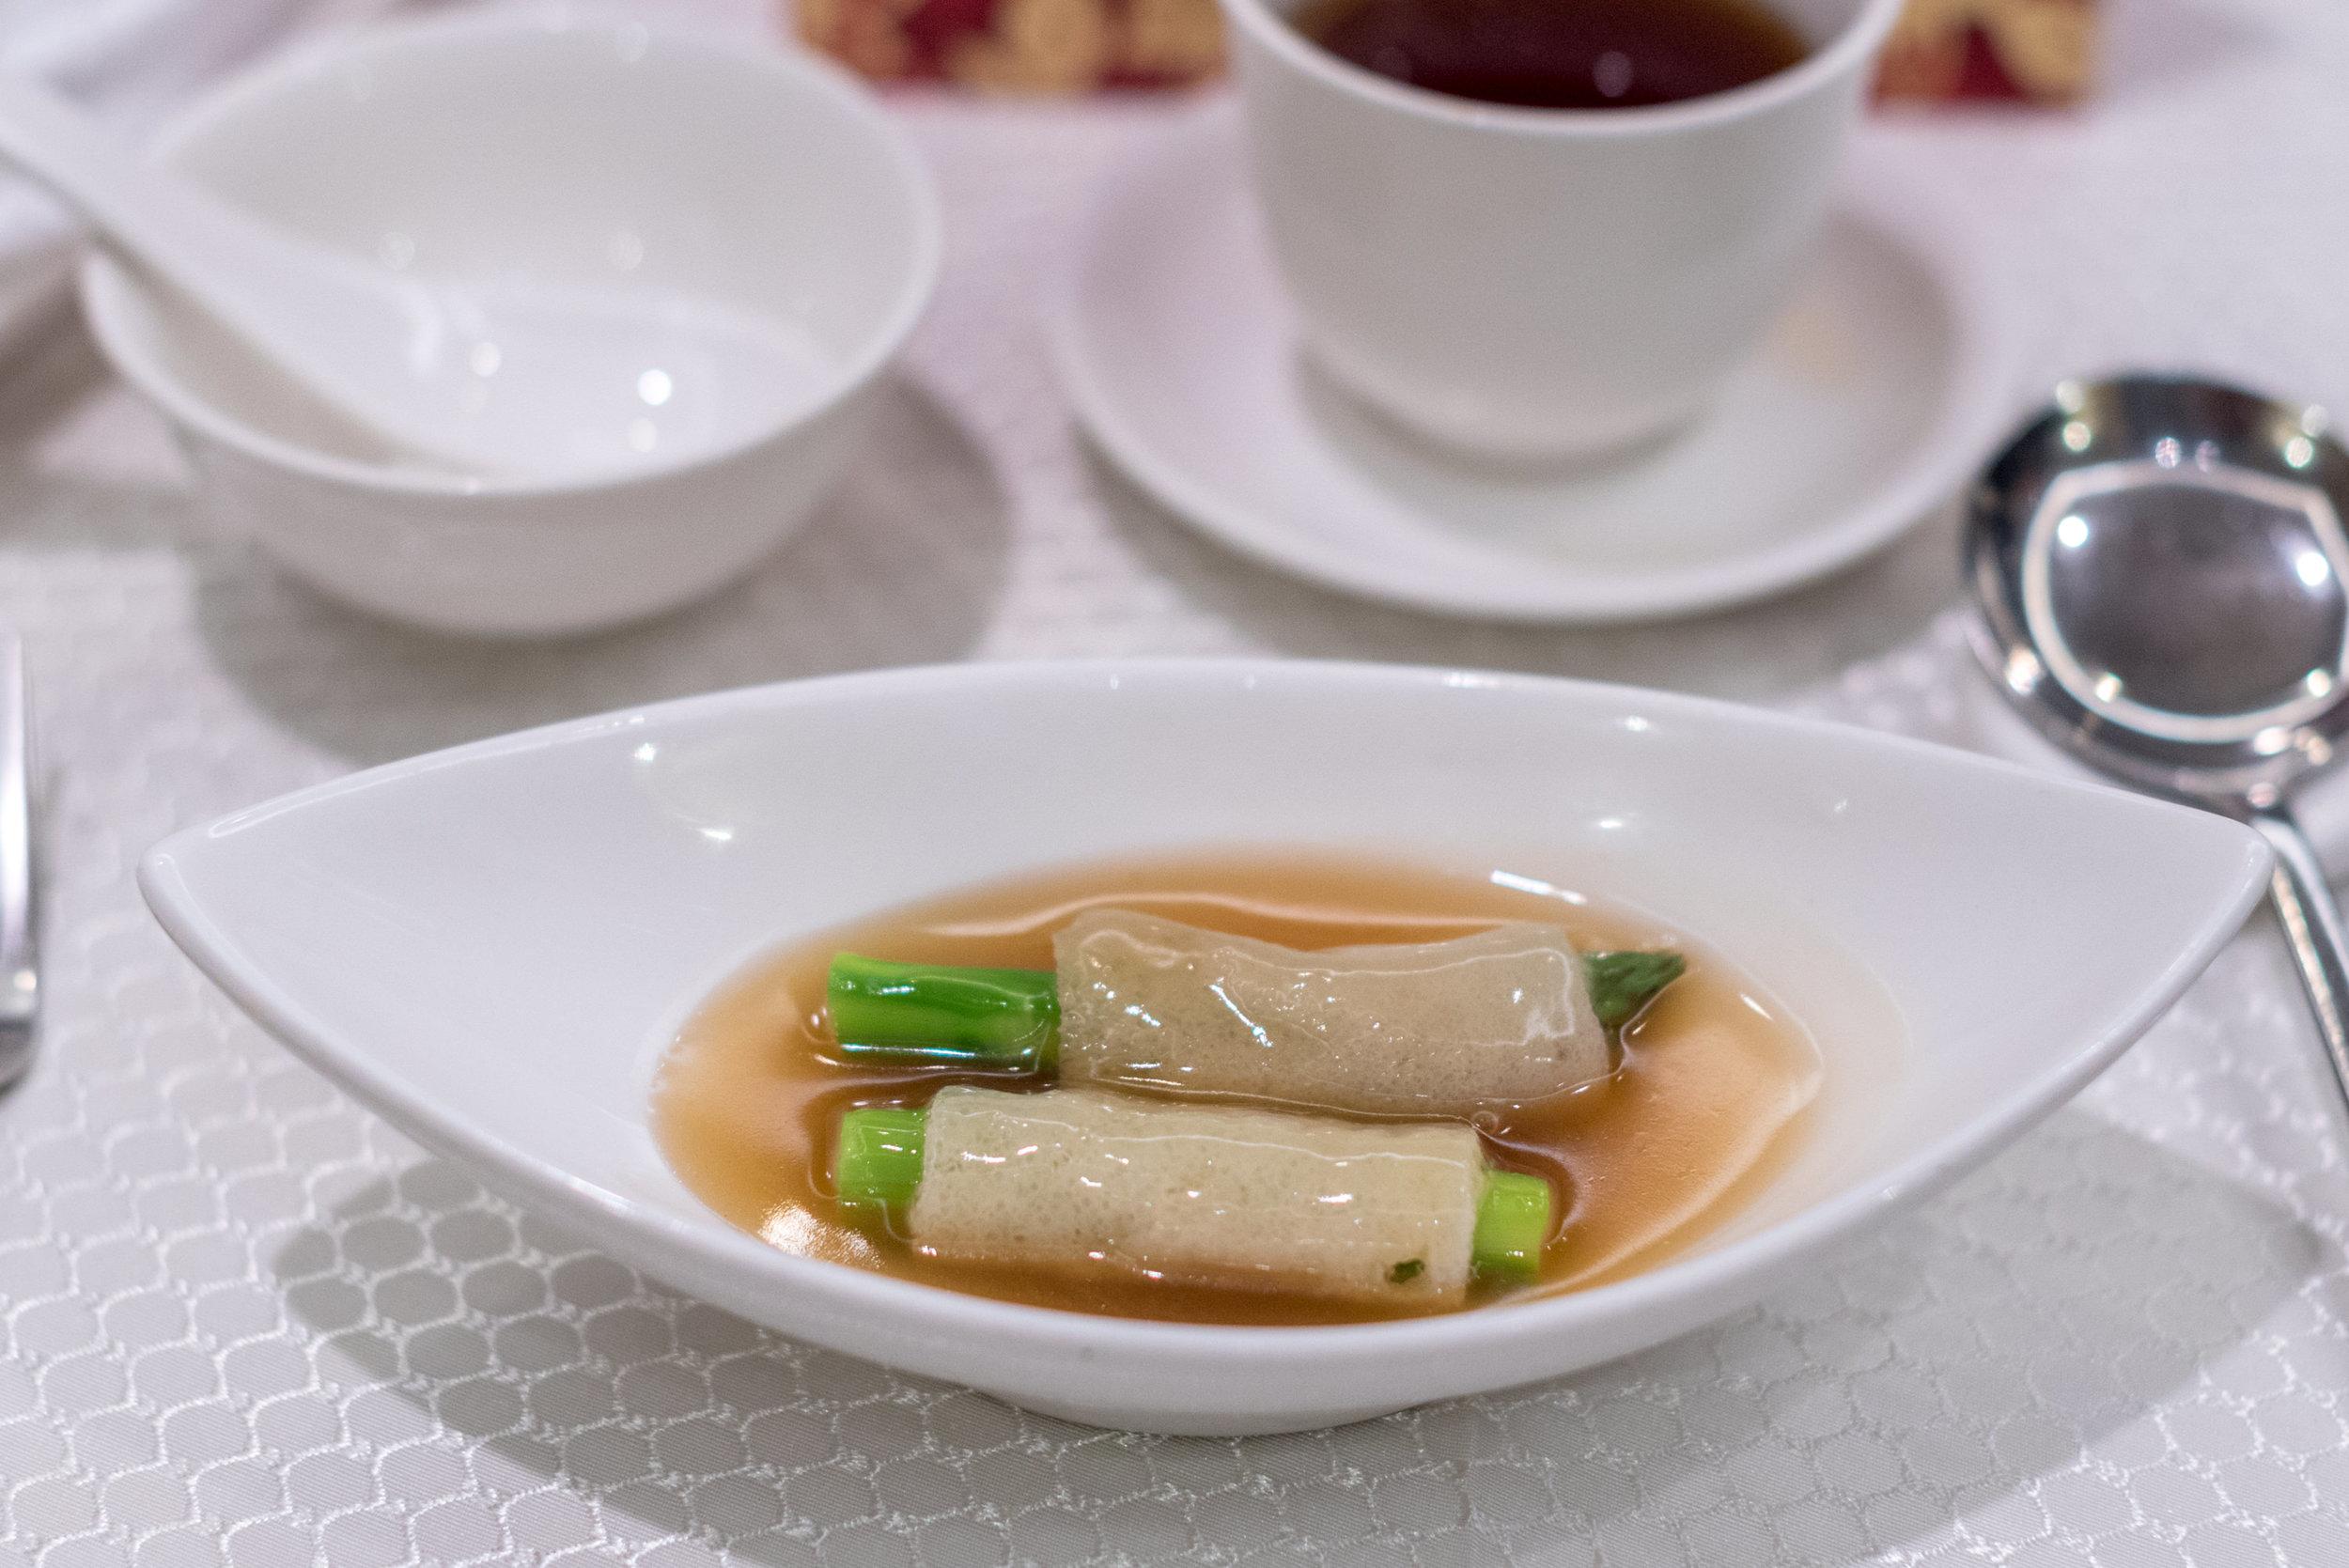 Braised Asparagus stuffed in Bamboo Fungus  Wah Lok Cantonese Restaurant - Carlton Hotel Singapore